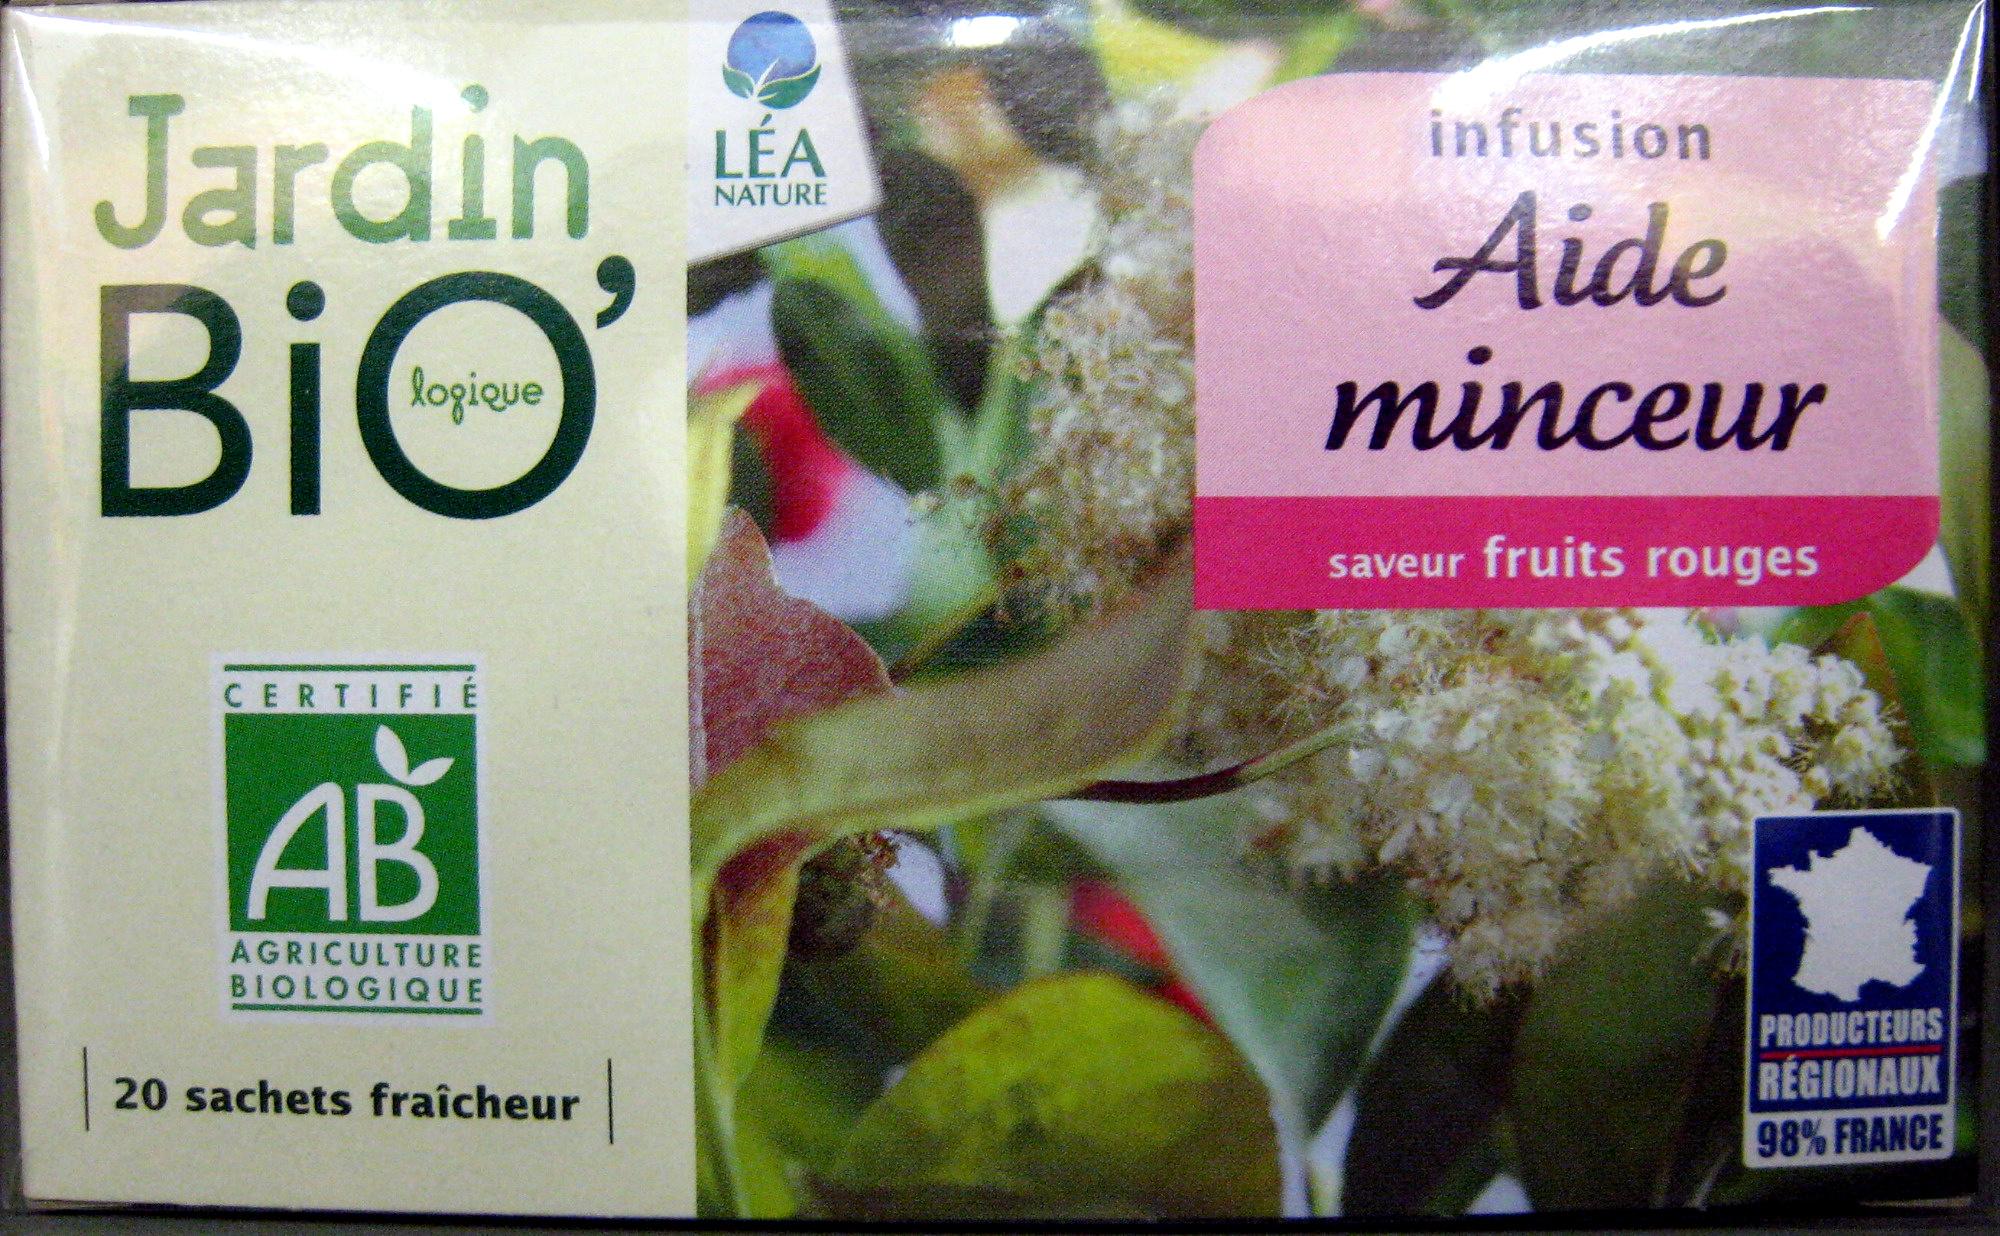 Infusion Aide minceur saveur fruits rouges Jardin Bio - Product